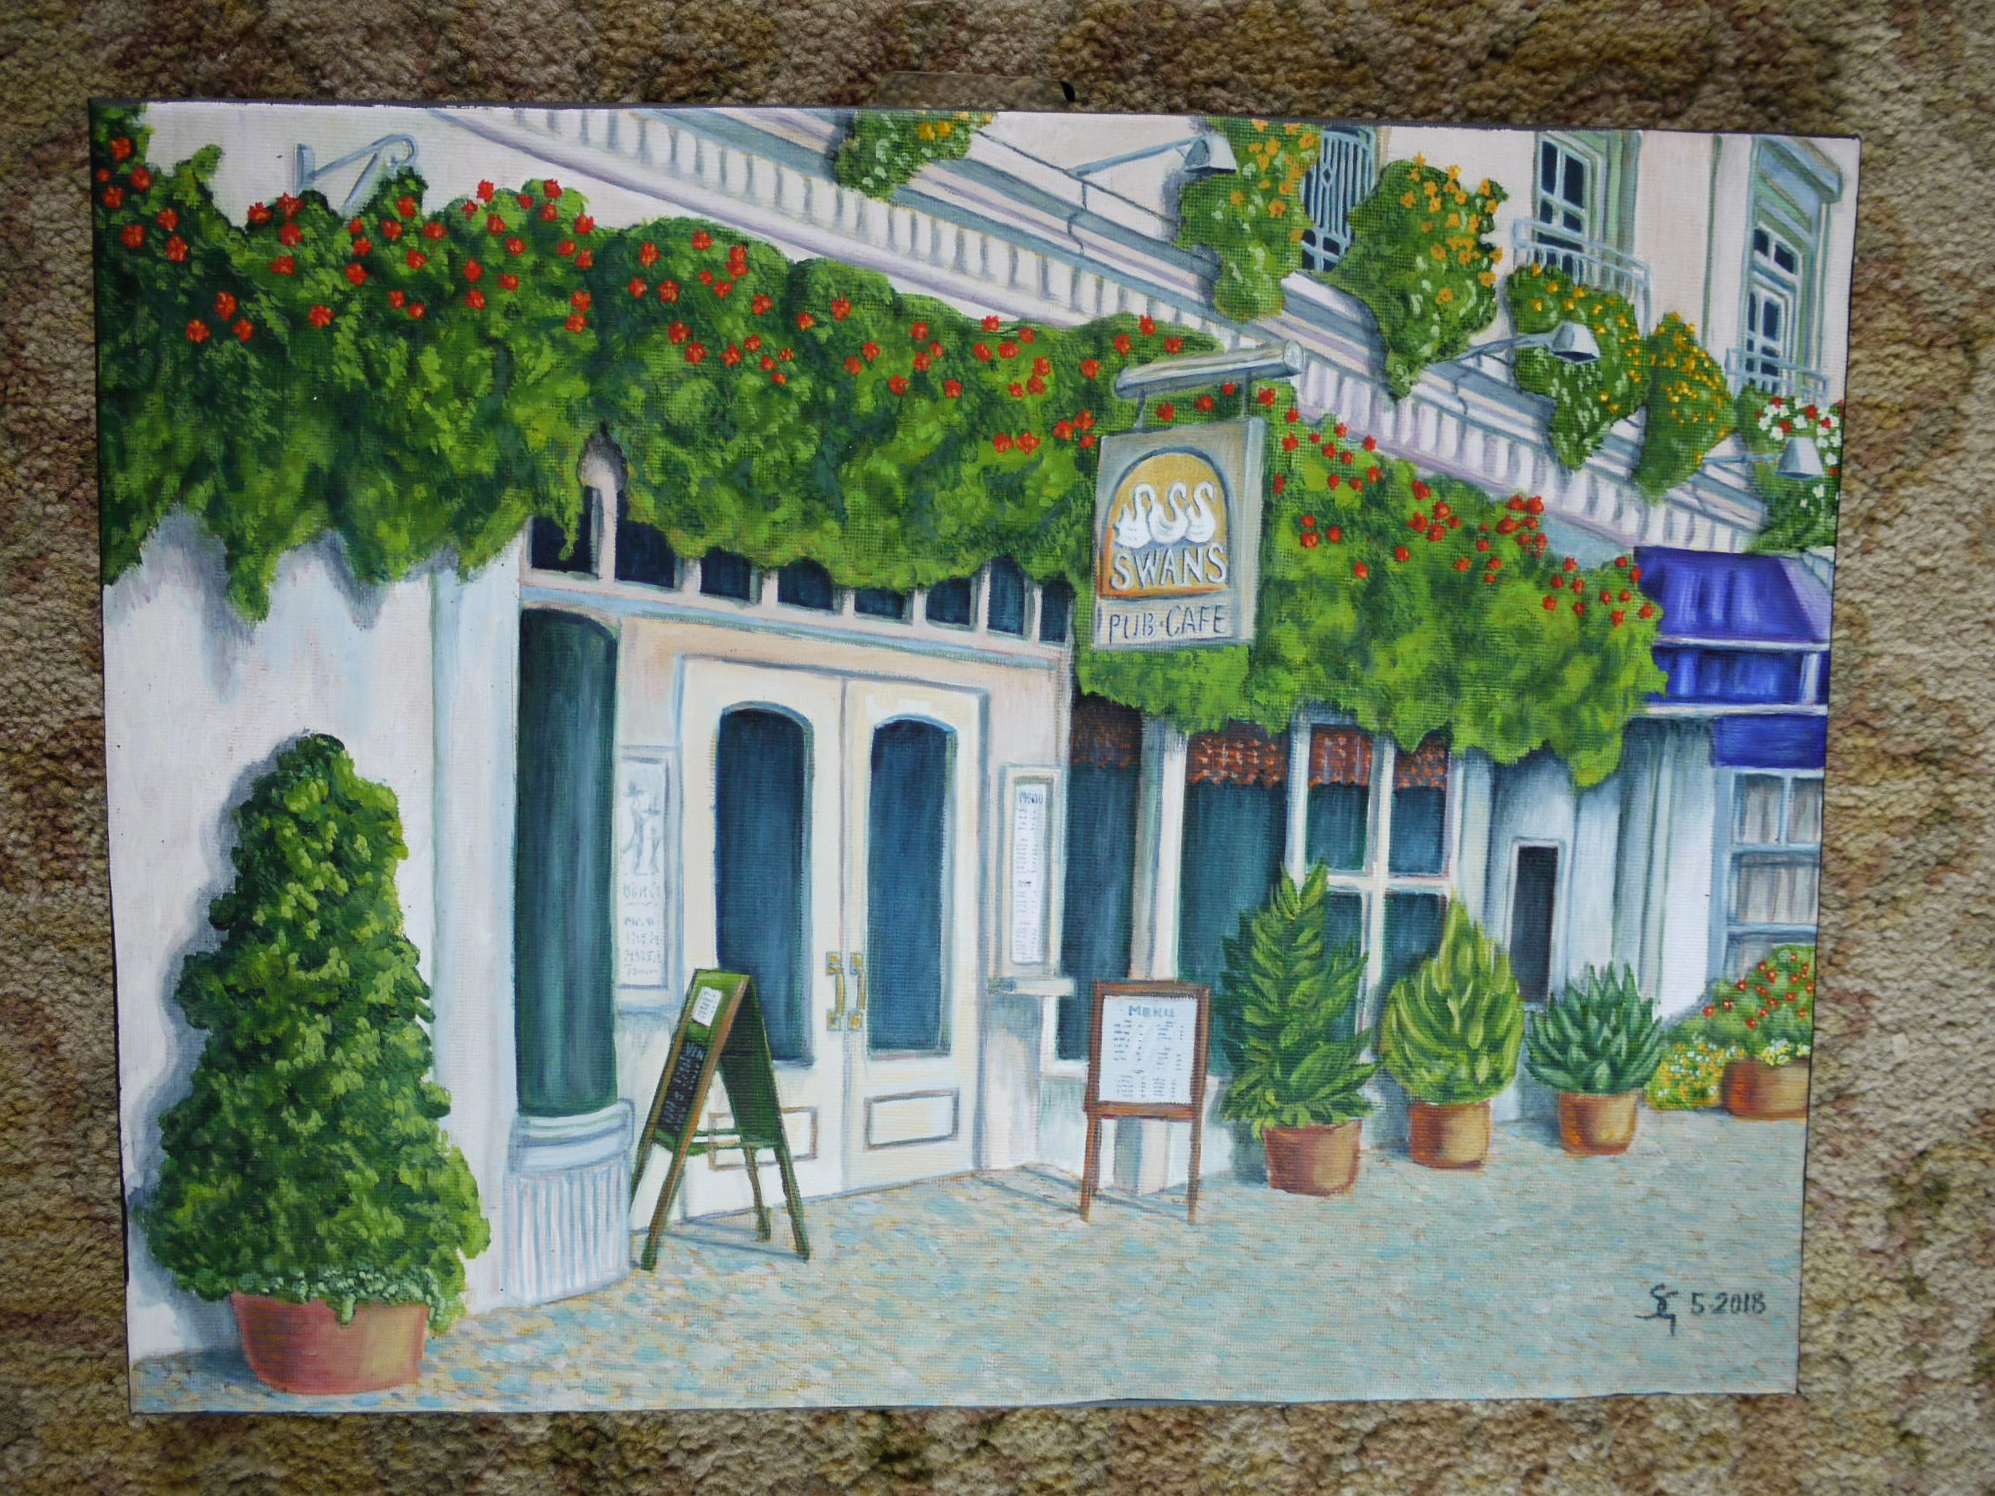 #469 - Bistro, oil on pre-printed canvas 12x15, 5/18